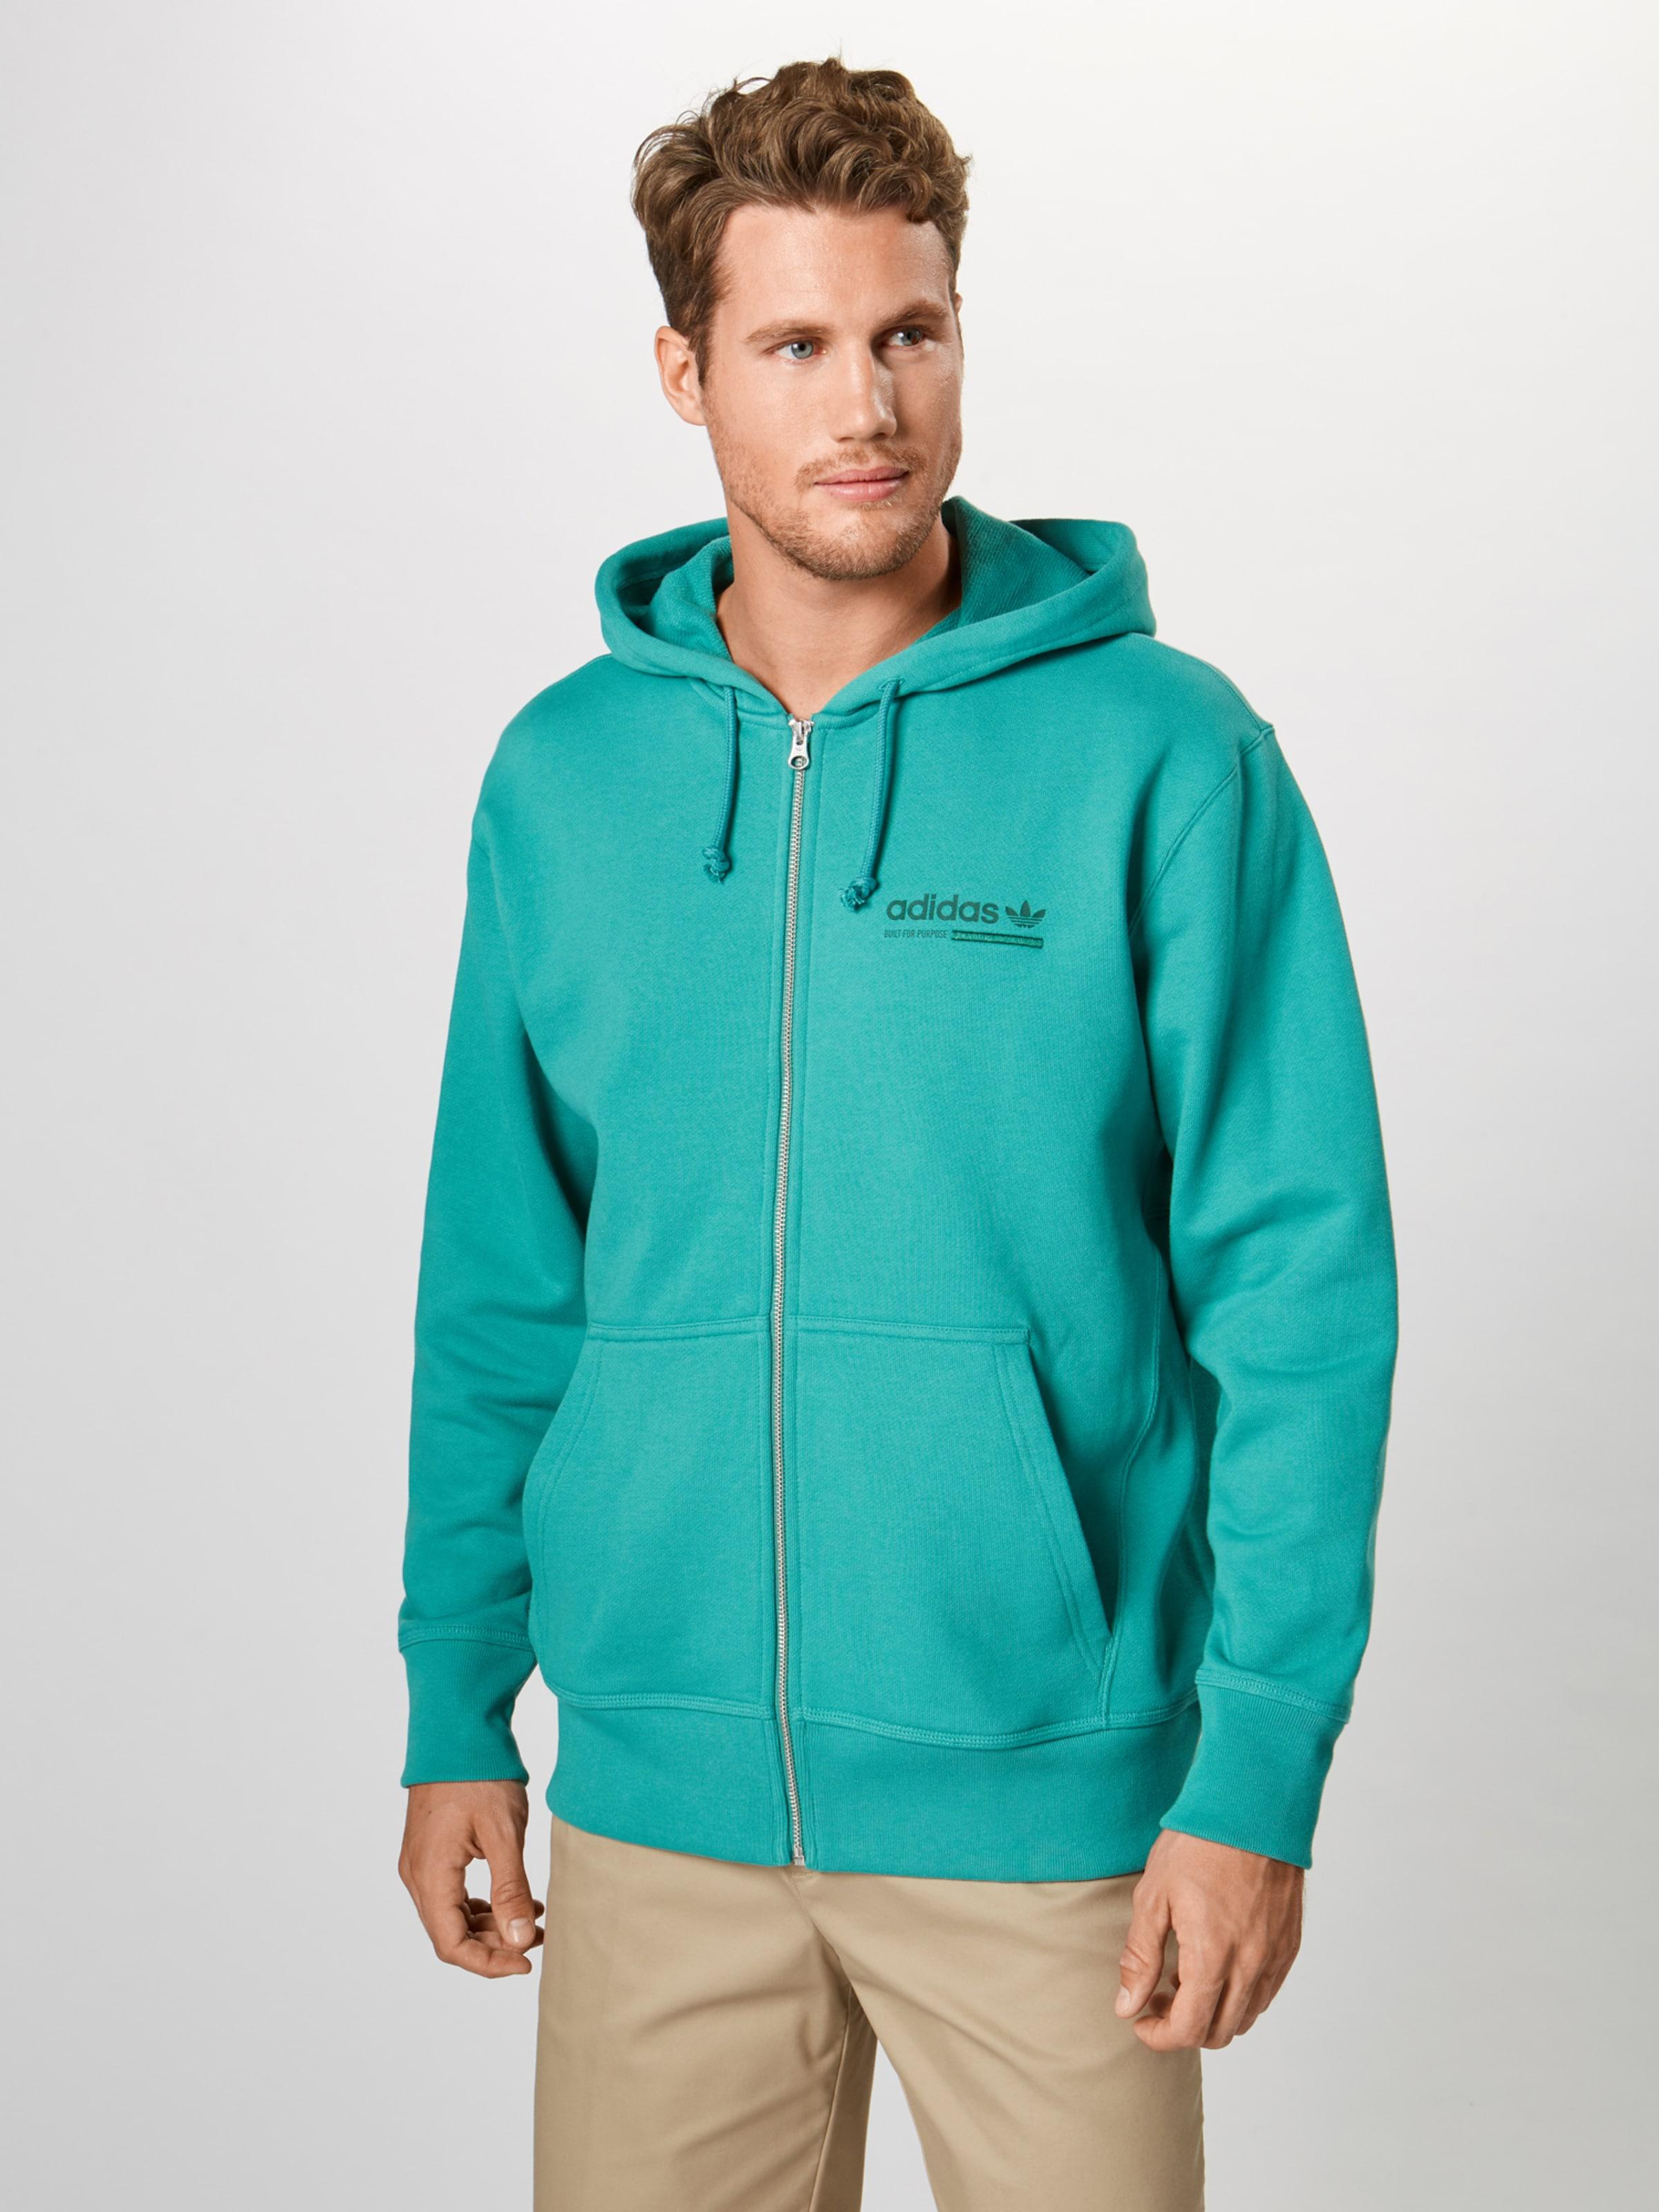 Originals Jade Veste Adidas De 'kaval' En Survêtement FT3cKJl1